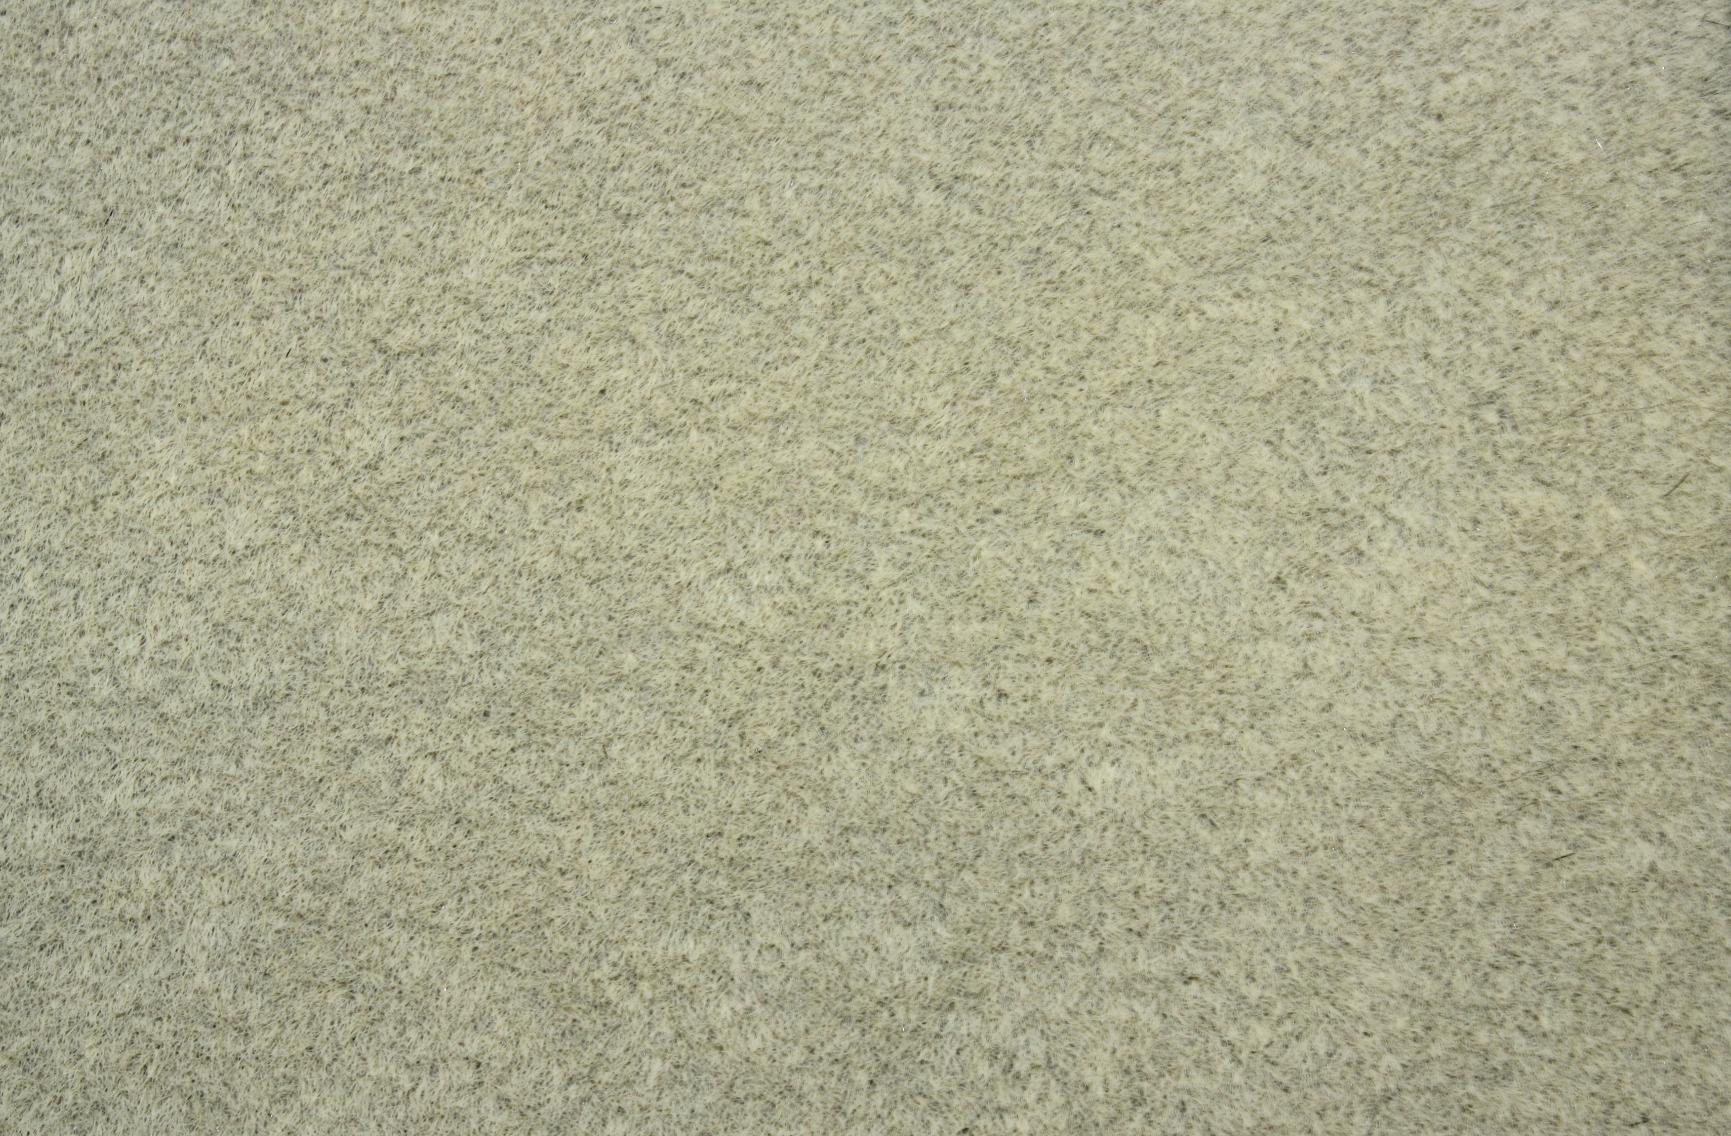 natural flocked auto carpet